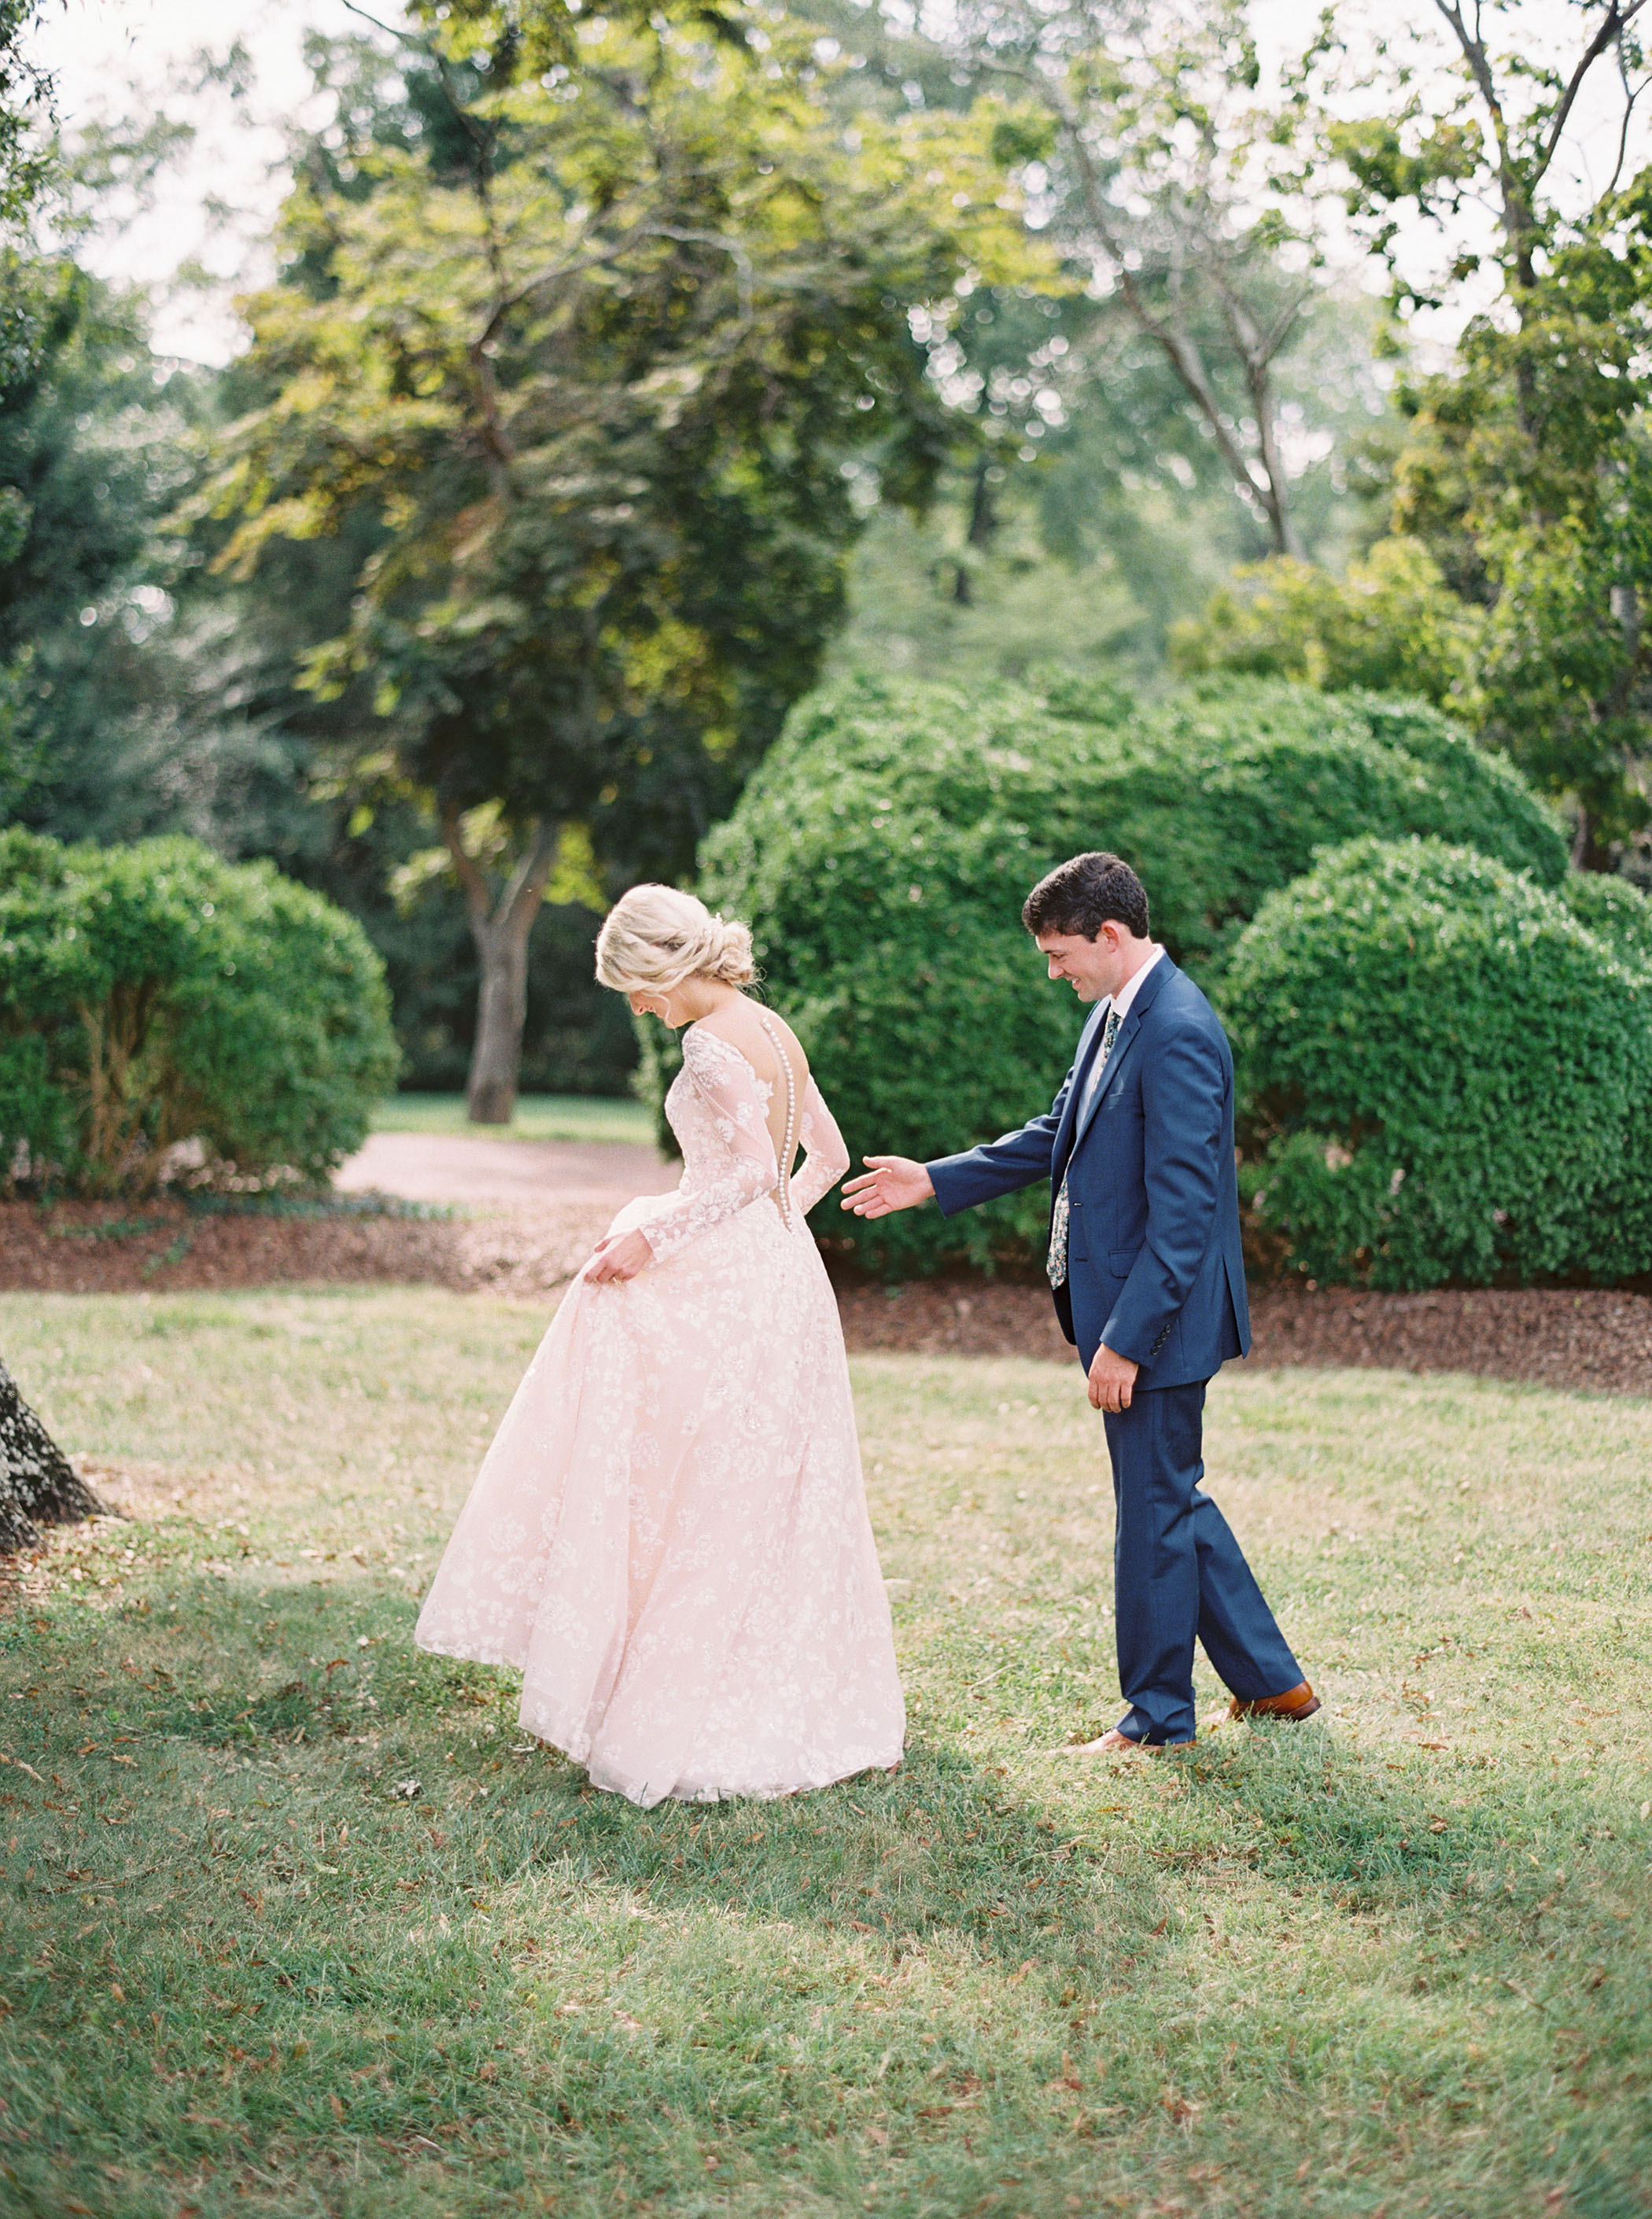 shelby preston wedding first look